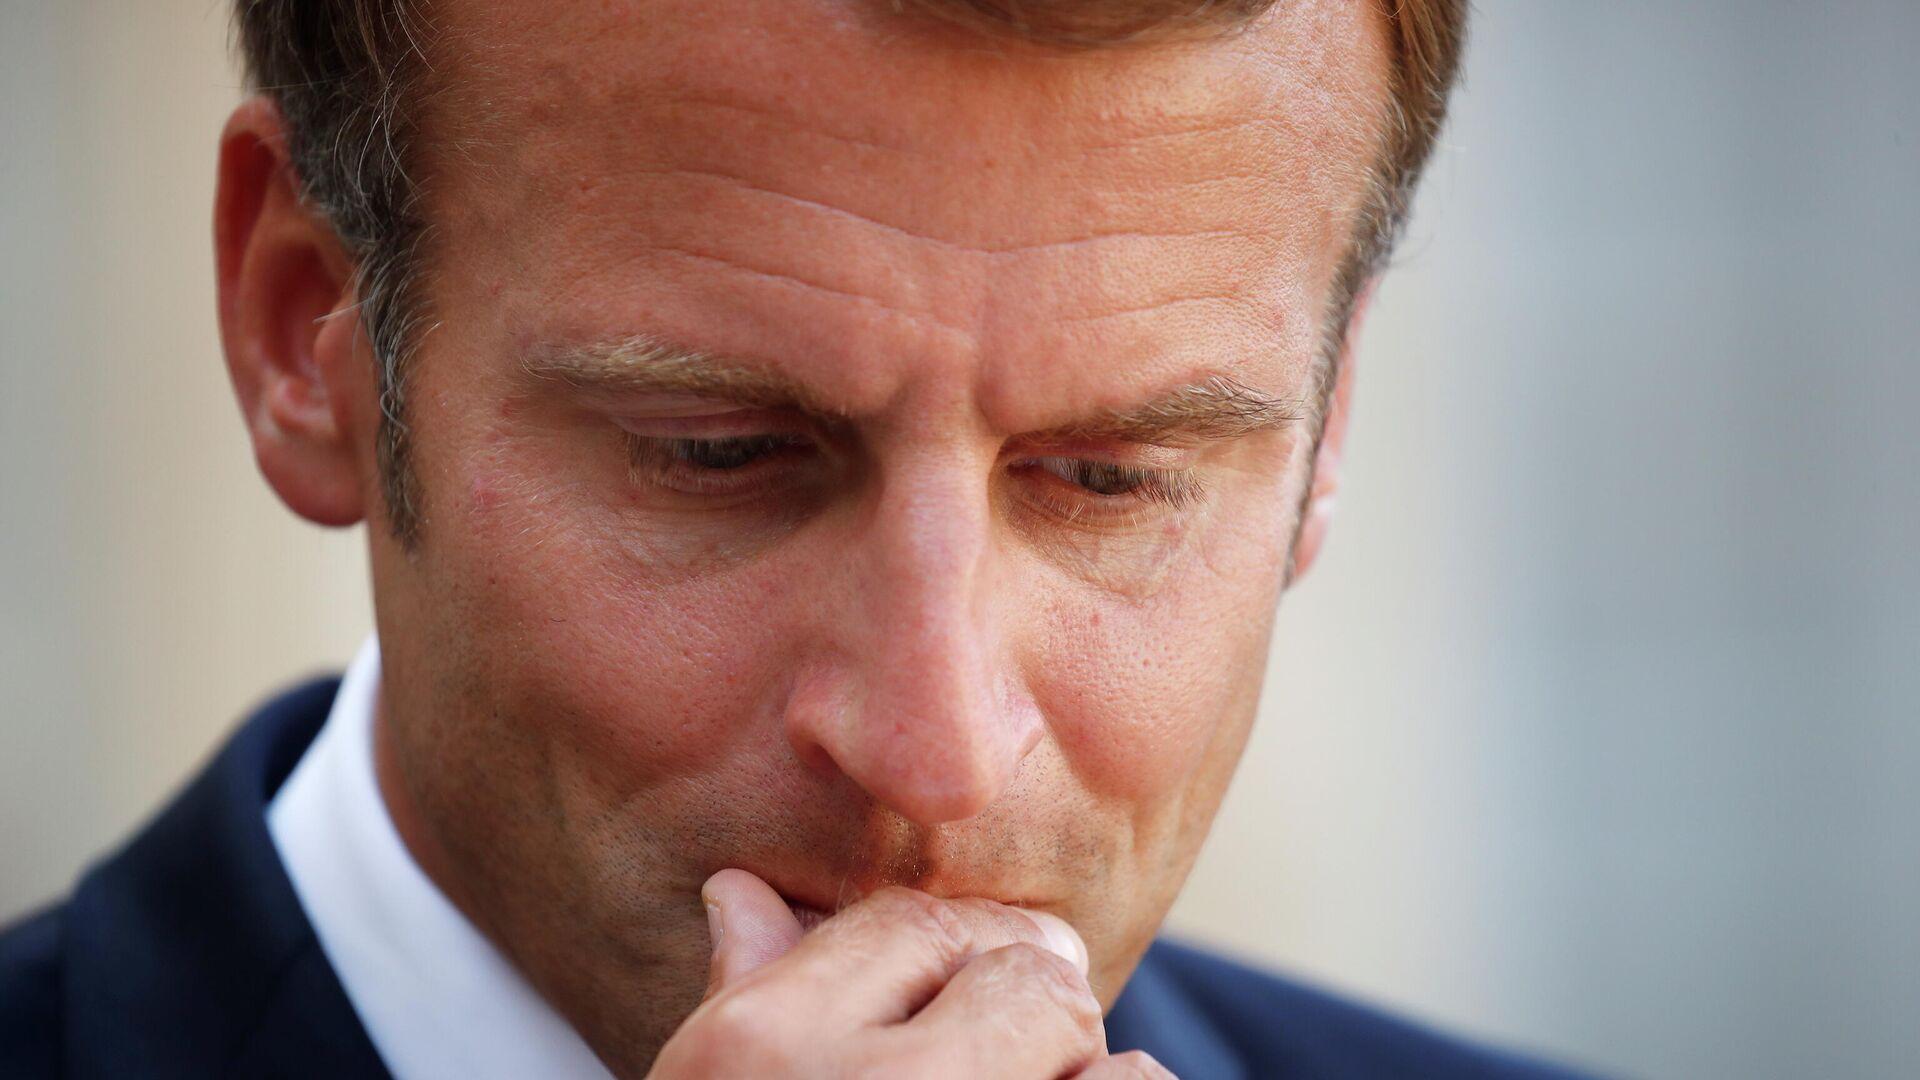 el presidente francés Emmanuel Macron - Sputnik Mundo, 1920, 21.09.2021